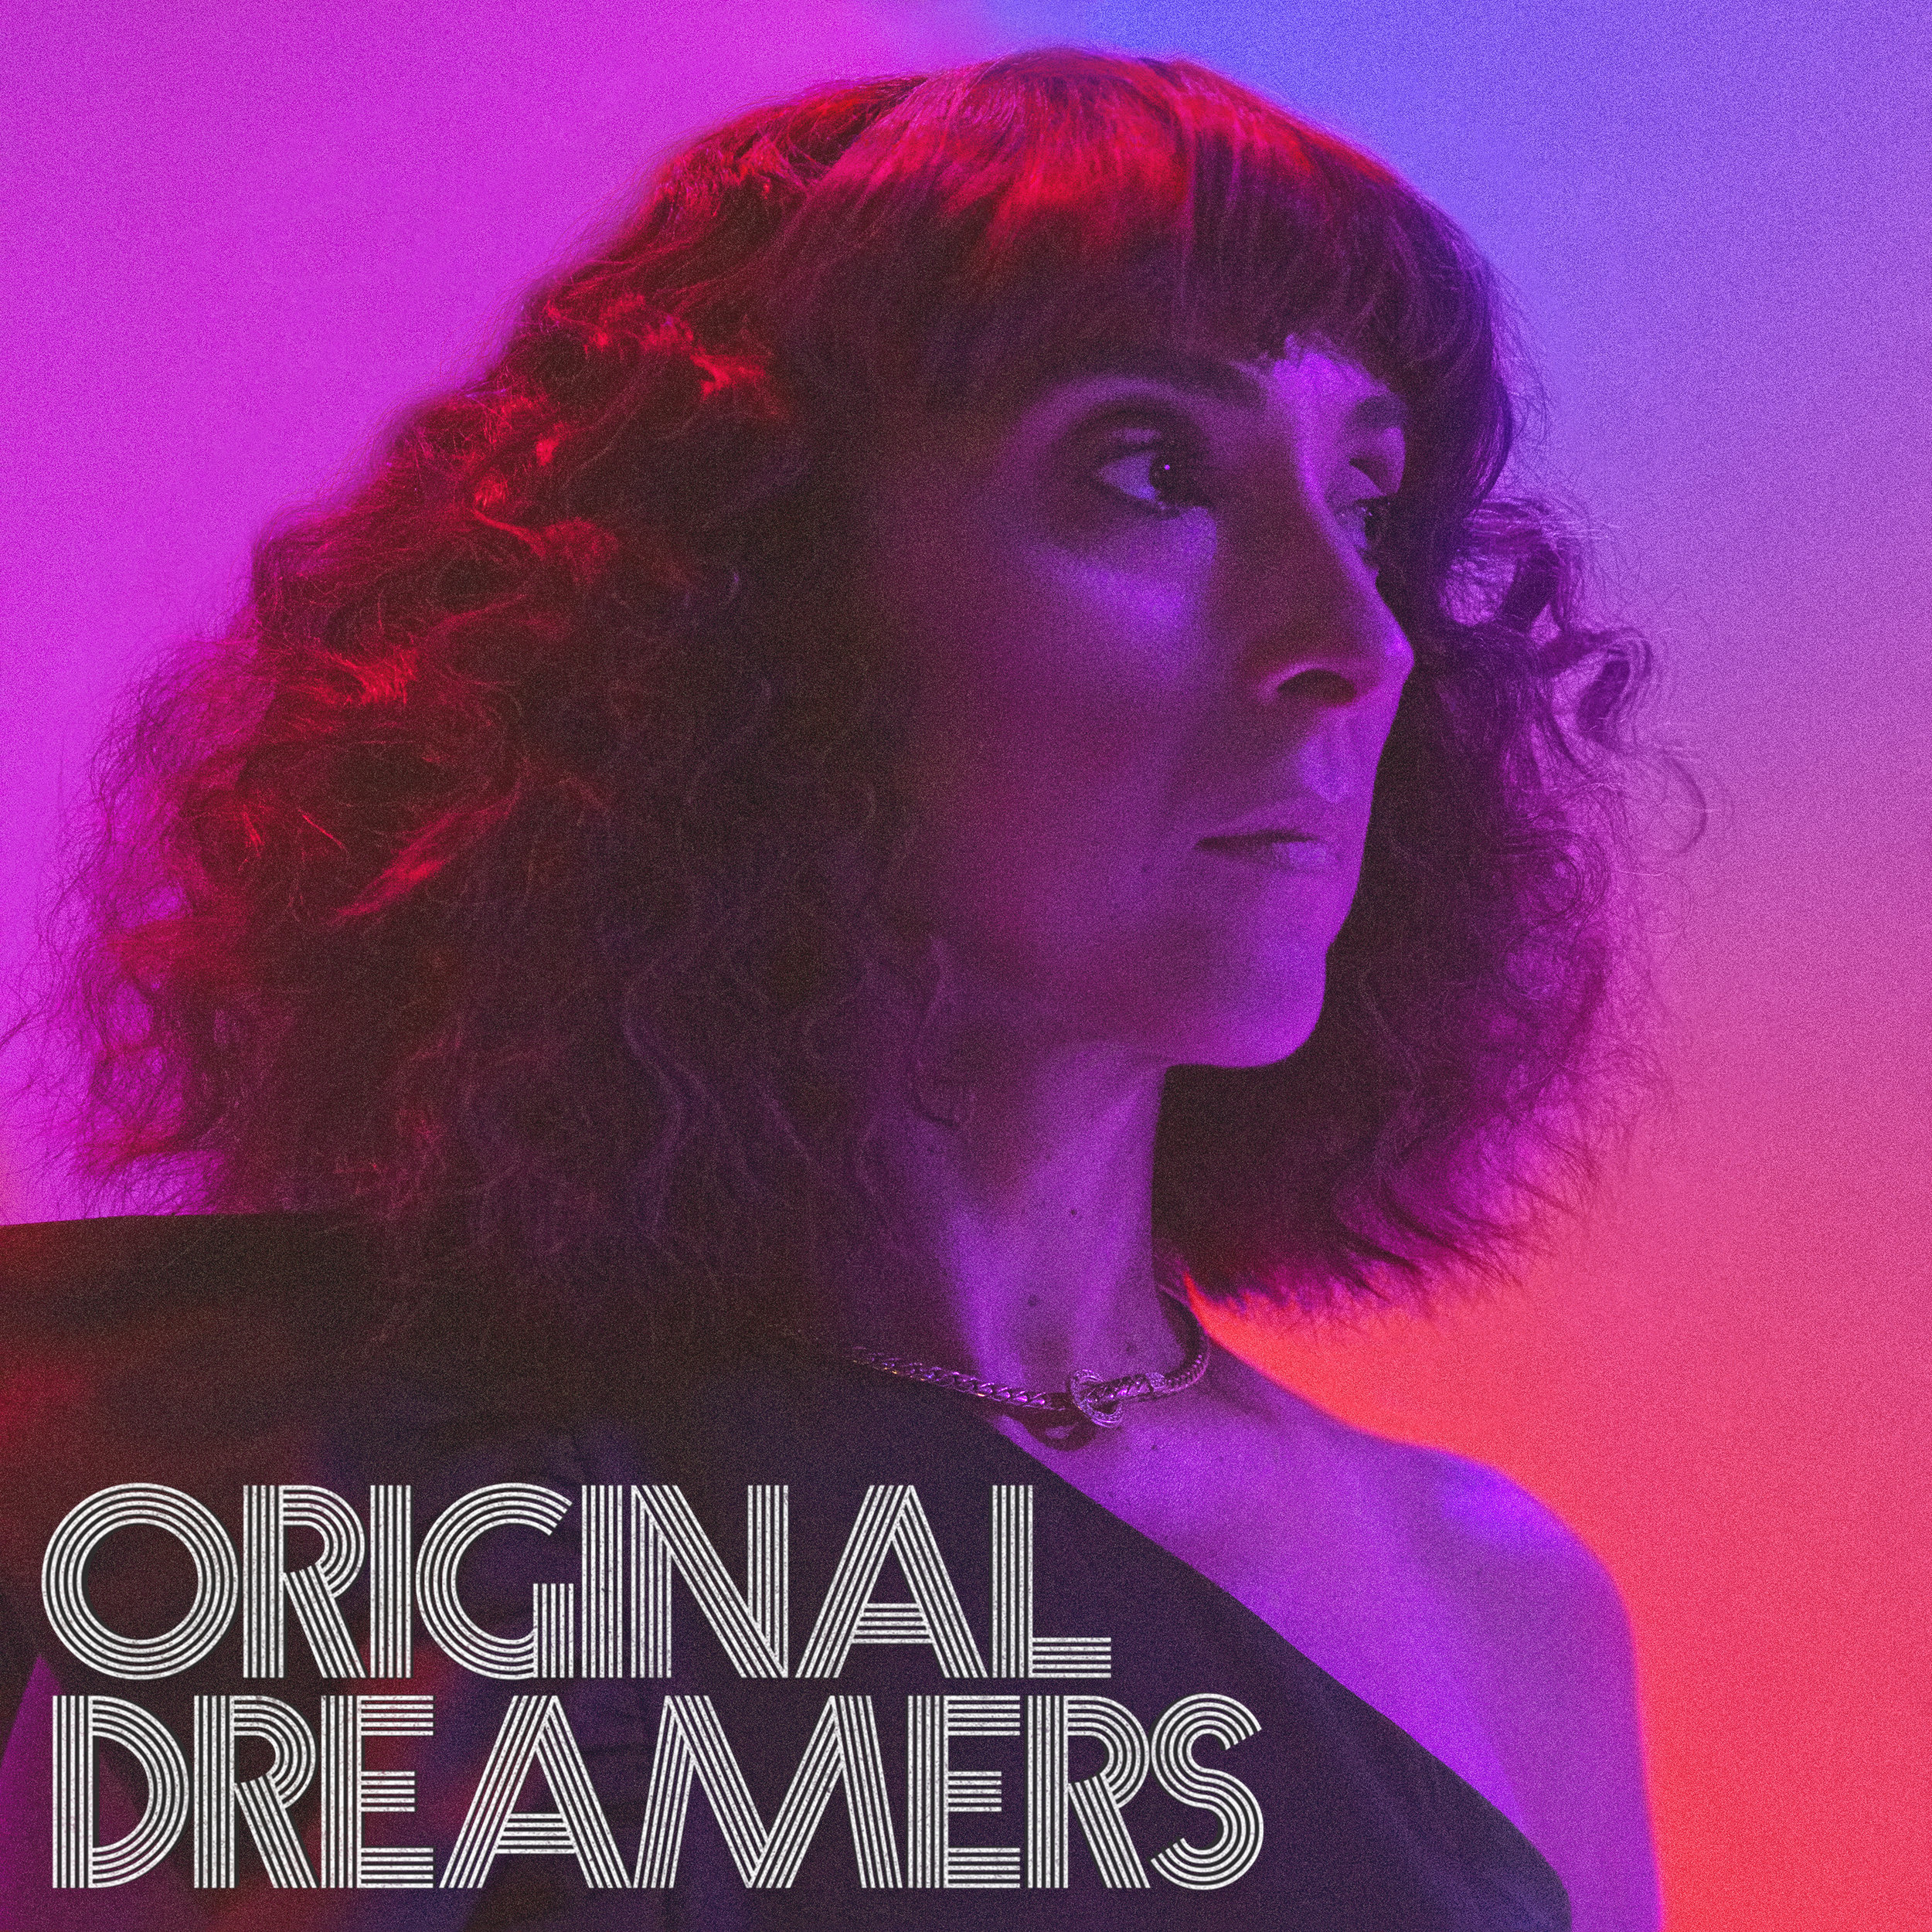 Original Dreamers 3000x3000.jpg